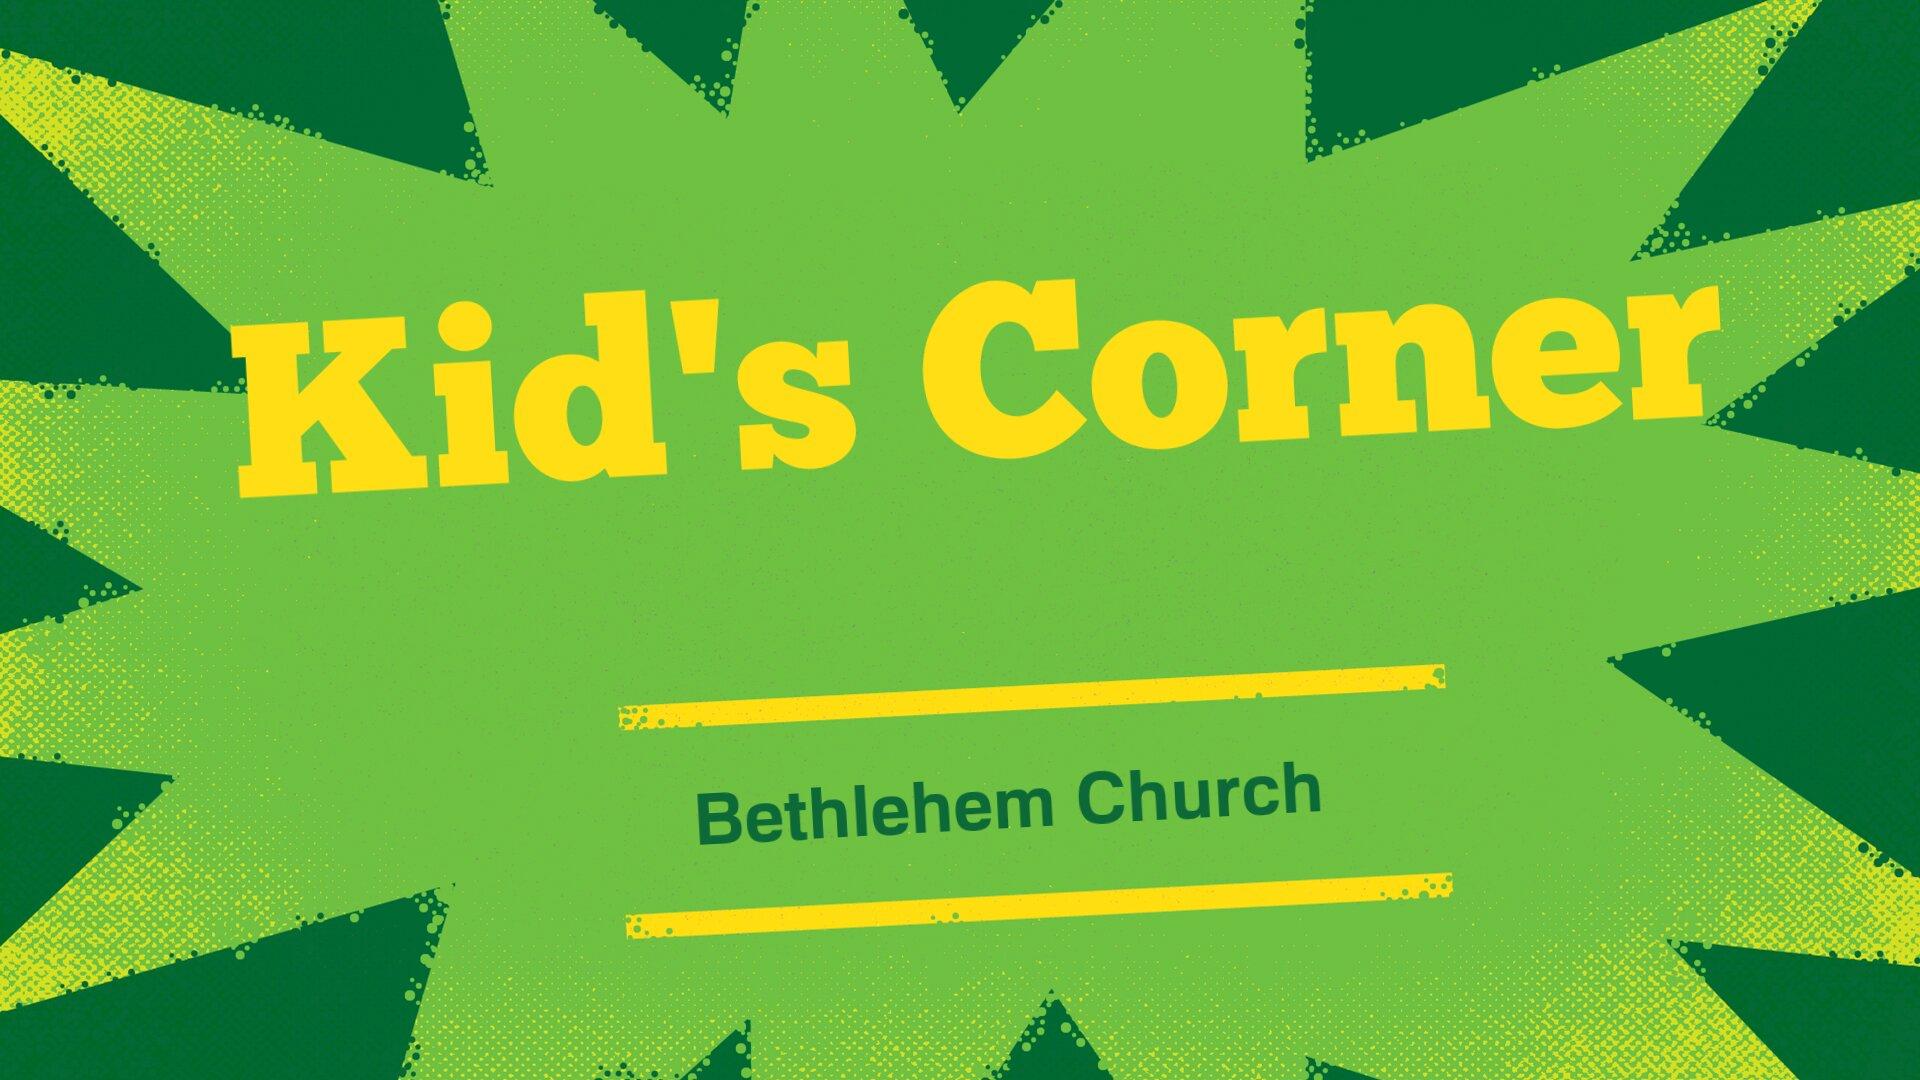 Kid's Corner Launch!